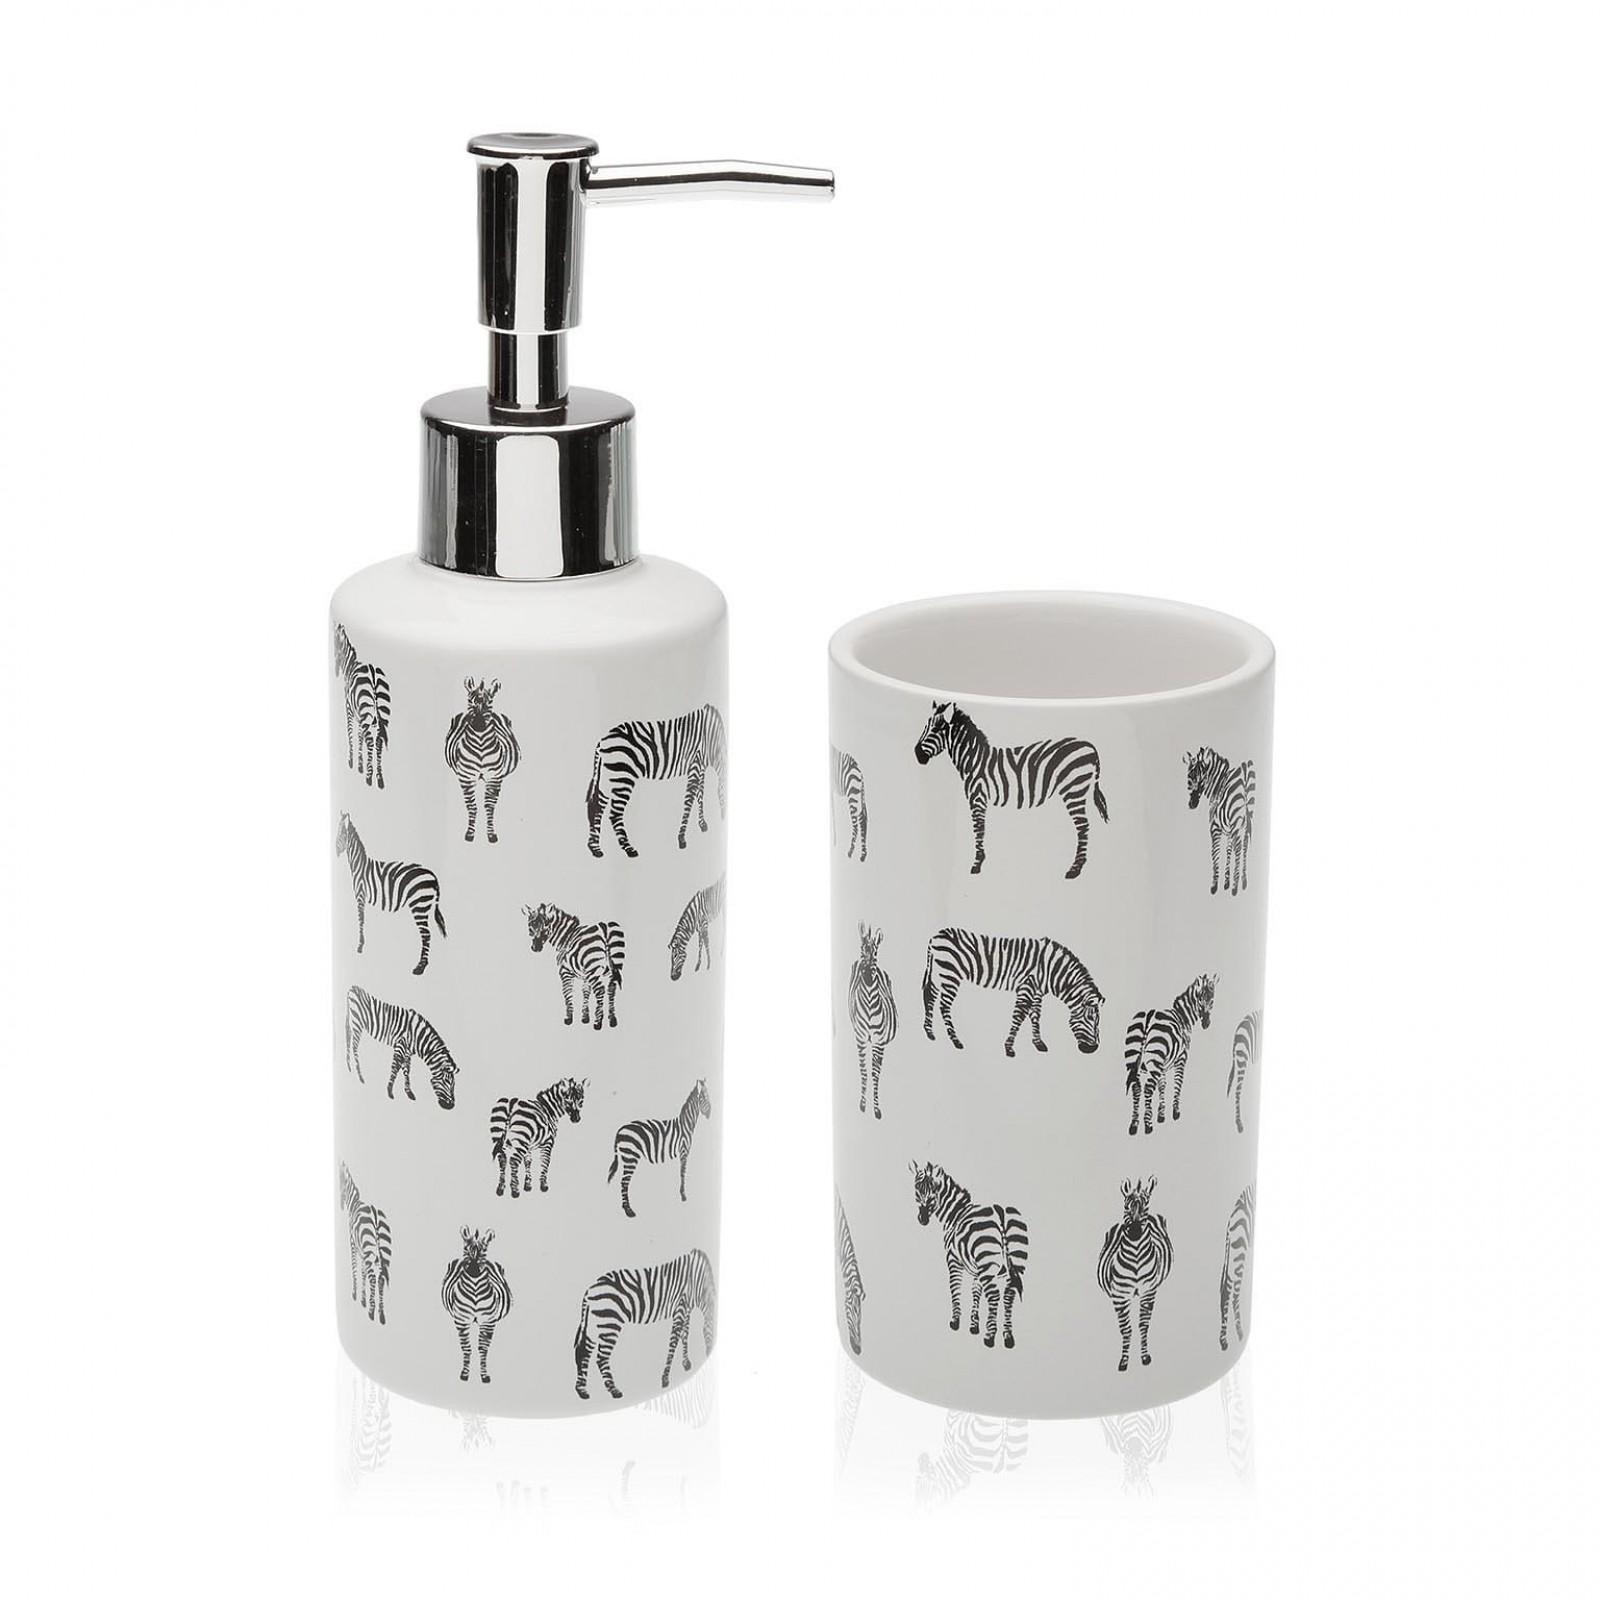 Zebra Soap Dispenser & Tumbler Set (Ceramic) - Versa